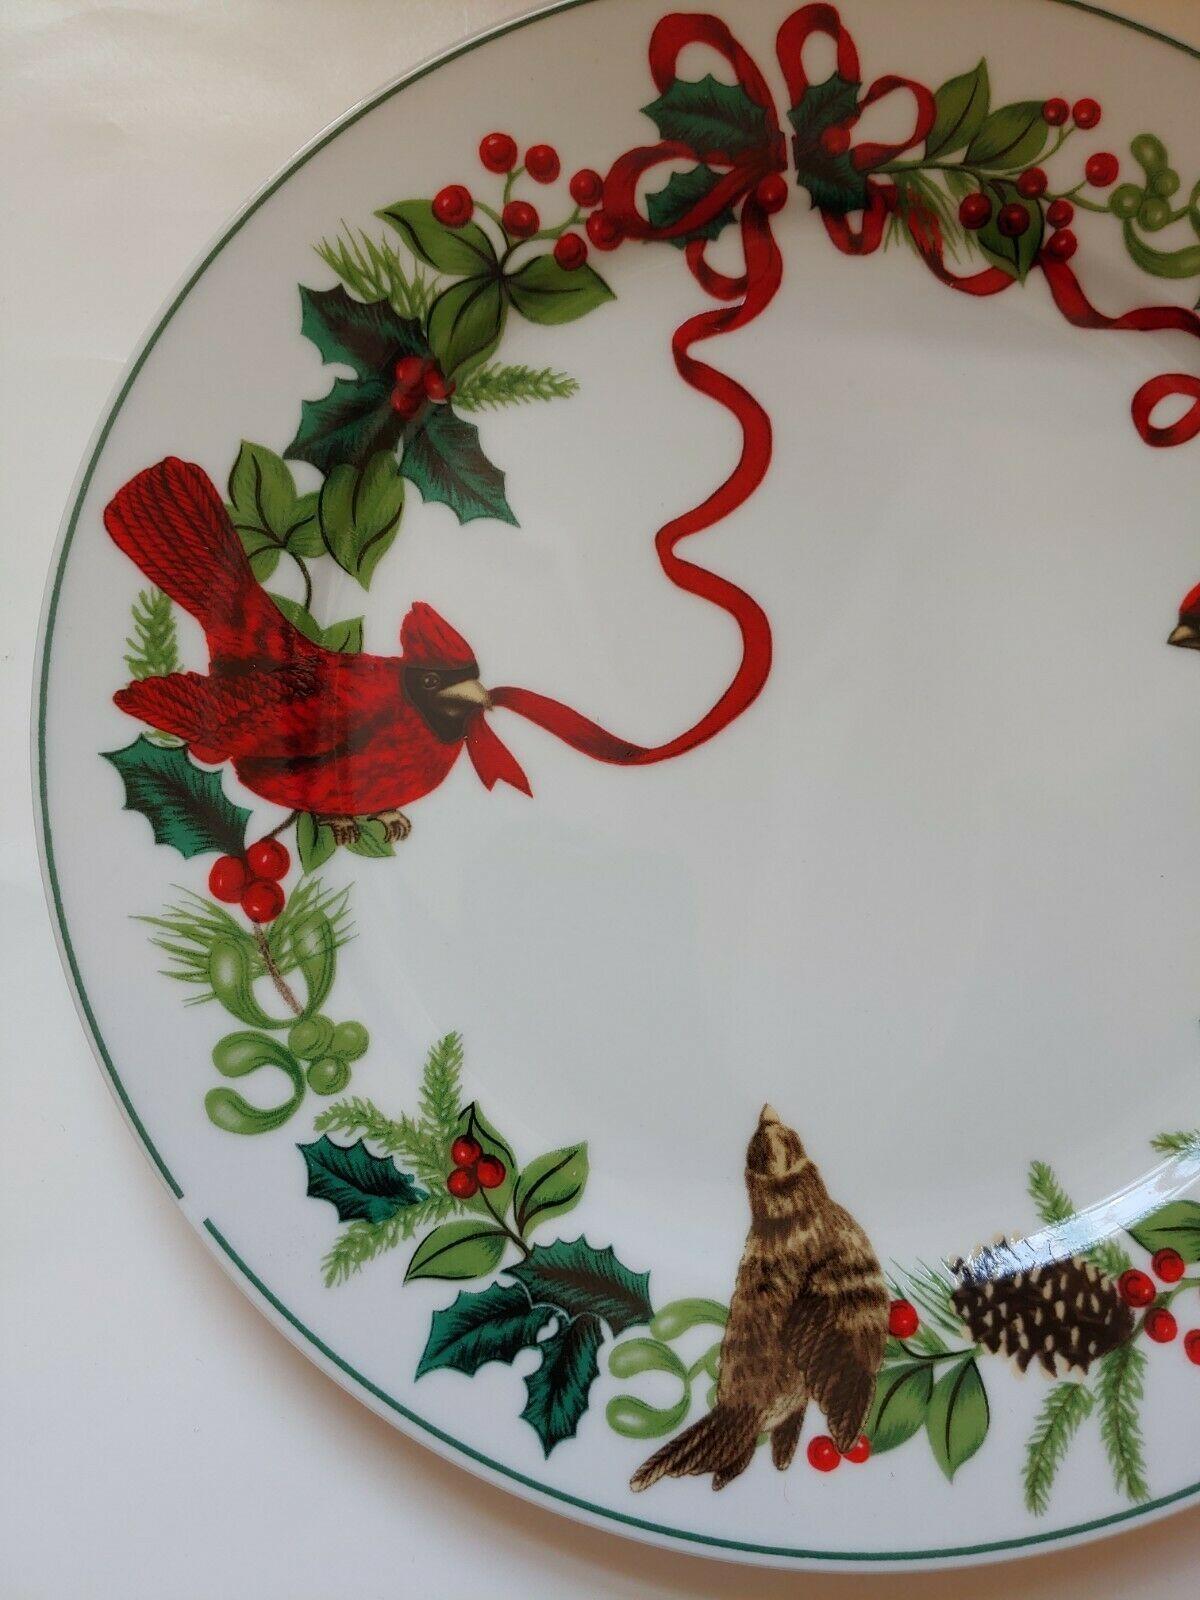 4 Royal Norfolk Dinner Plates Cardinal Christmas Red Holly Ribbon 10in Holiday - $29.69